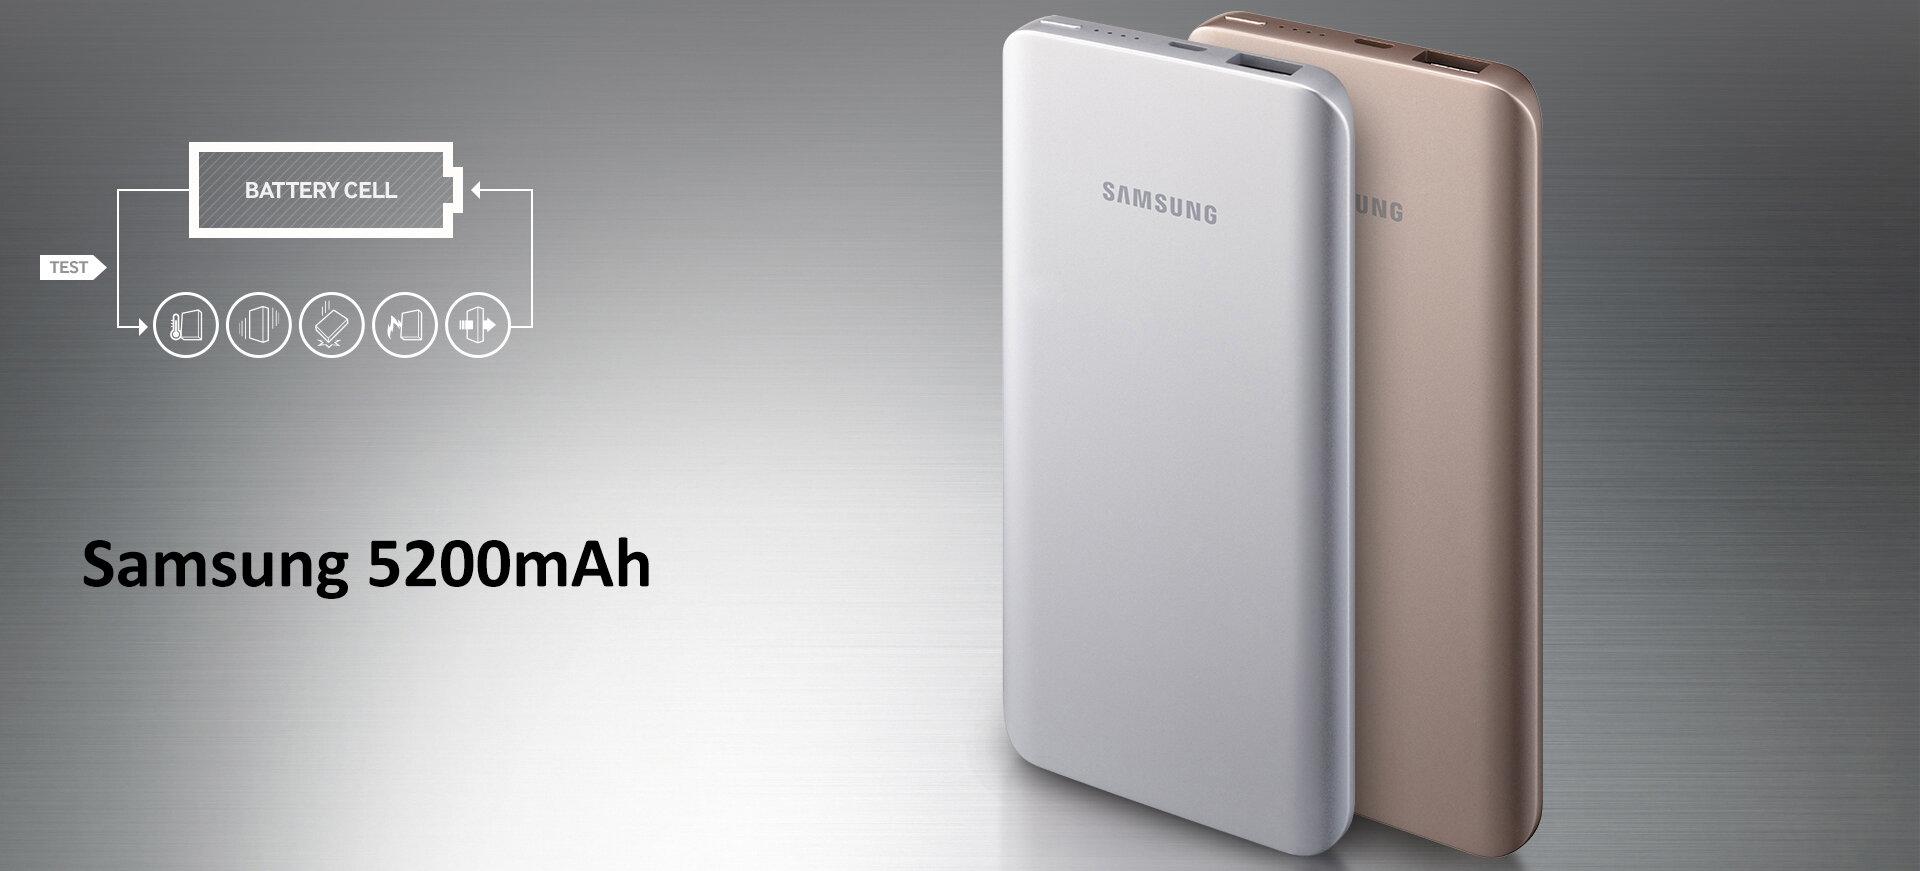 Samsung 5200mAh